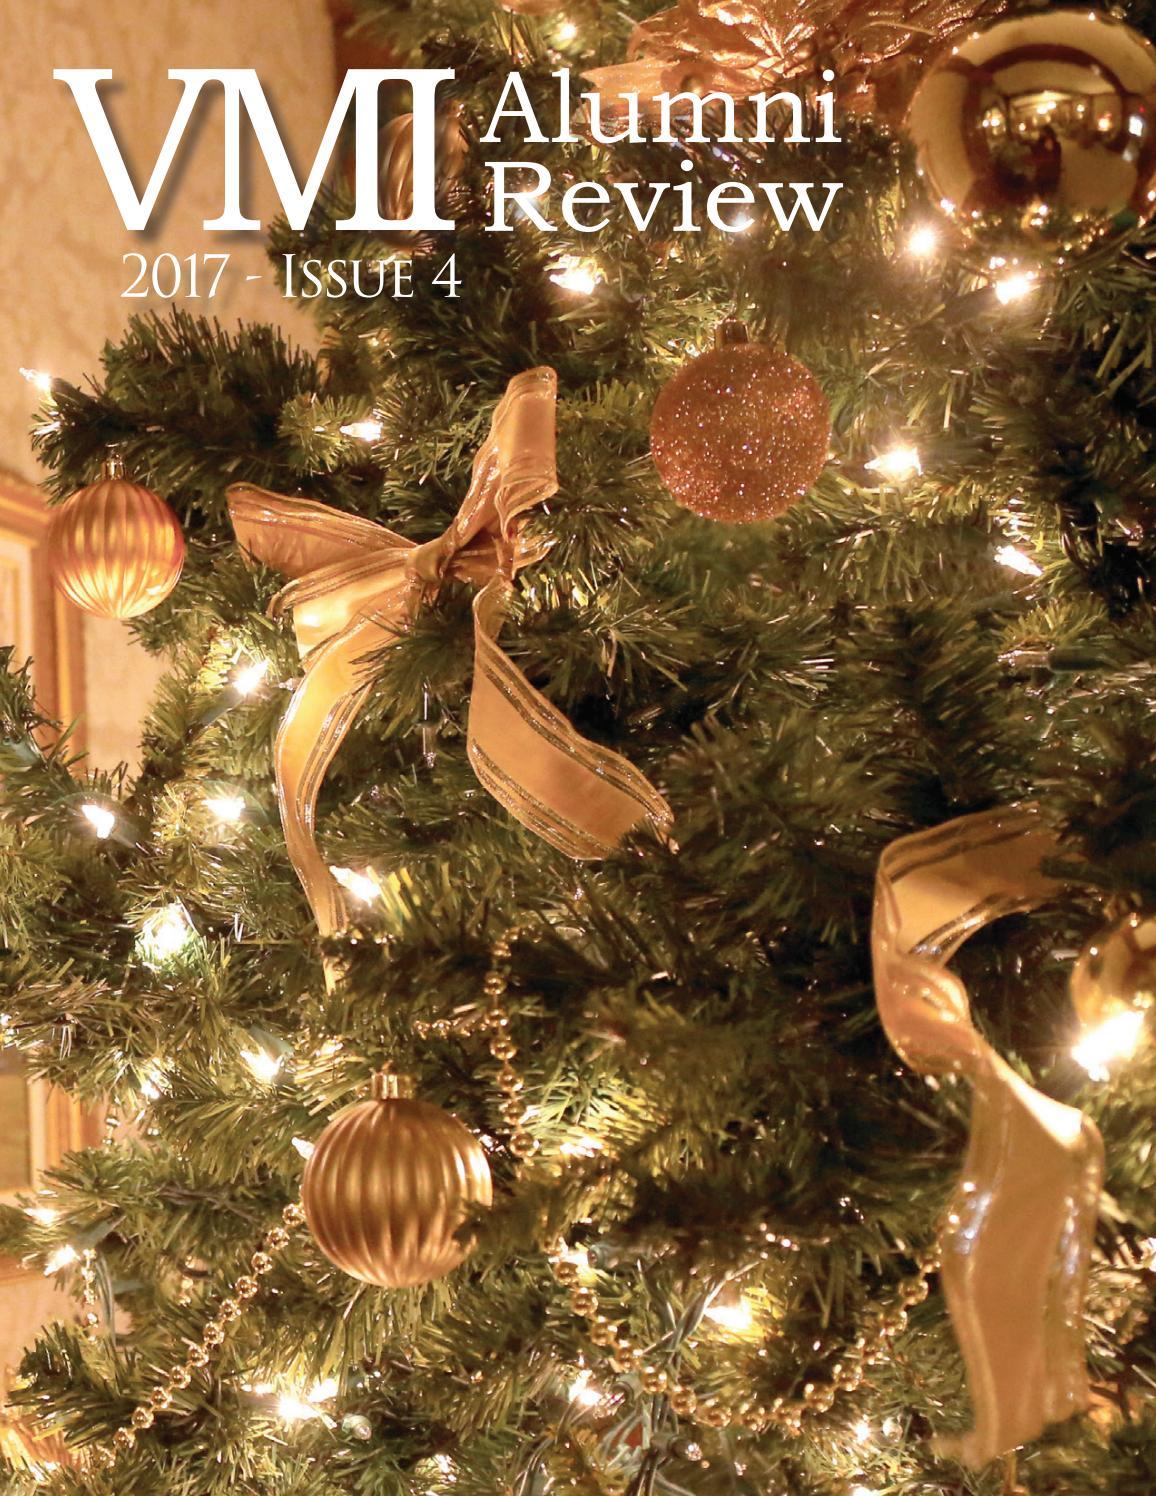 2017-4 Alumni Review by VMI Alumni Agencies - issuu 3016d7e70